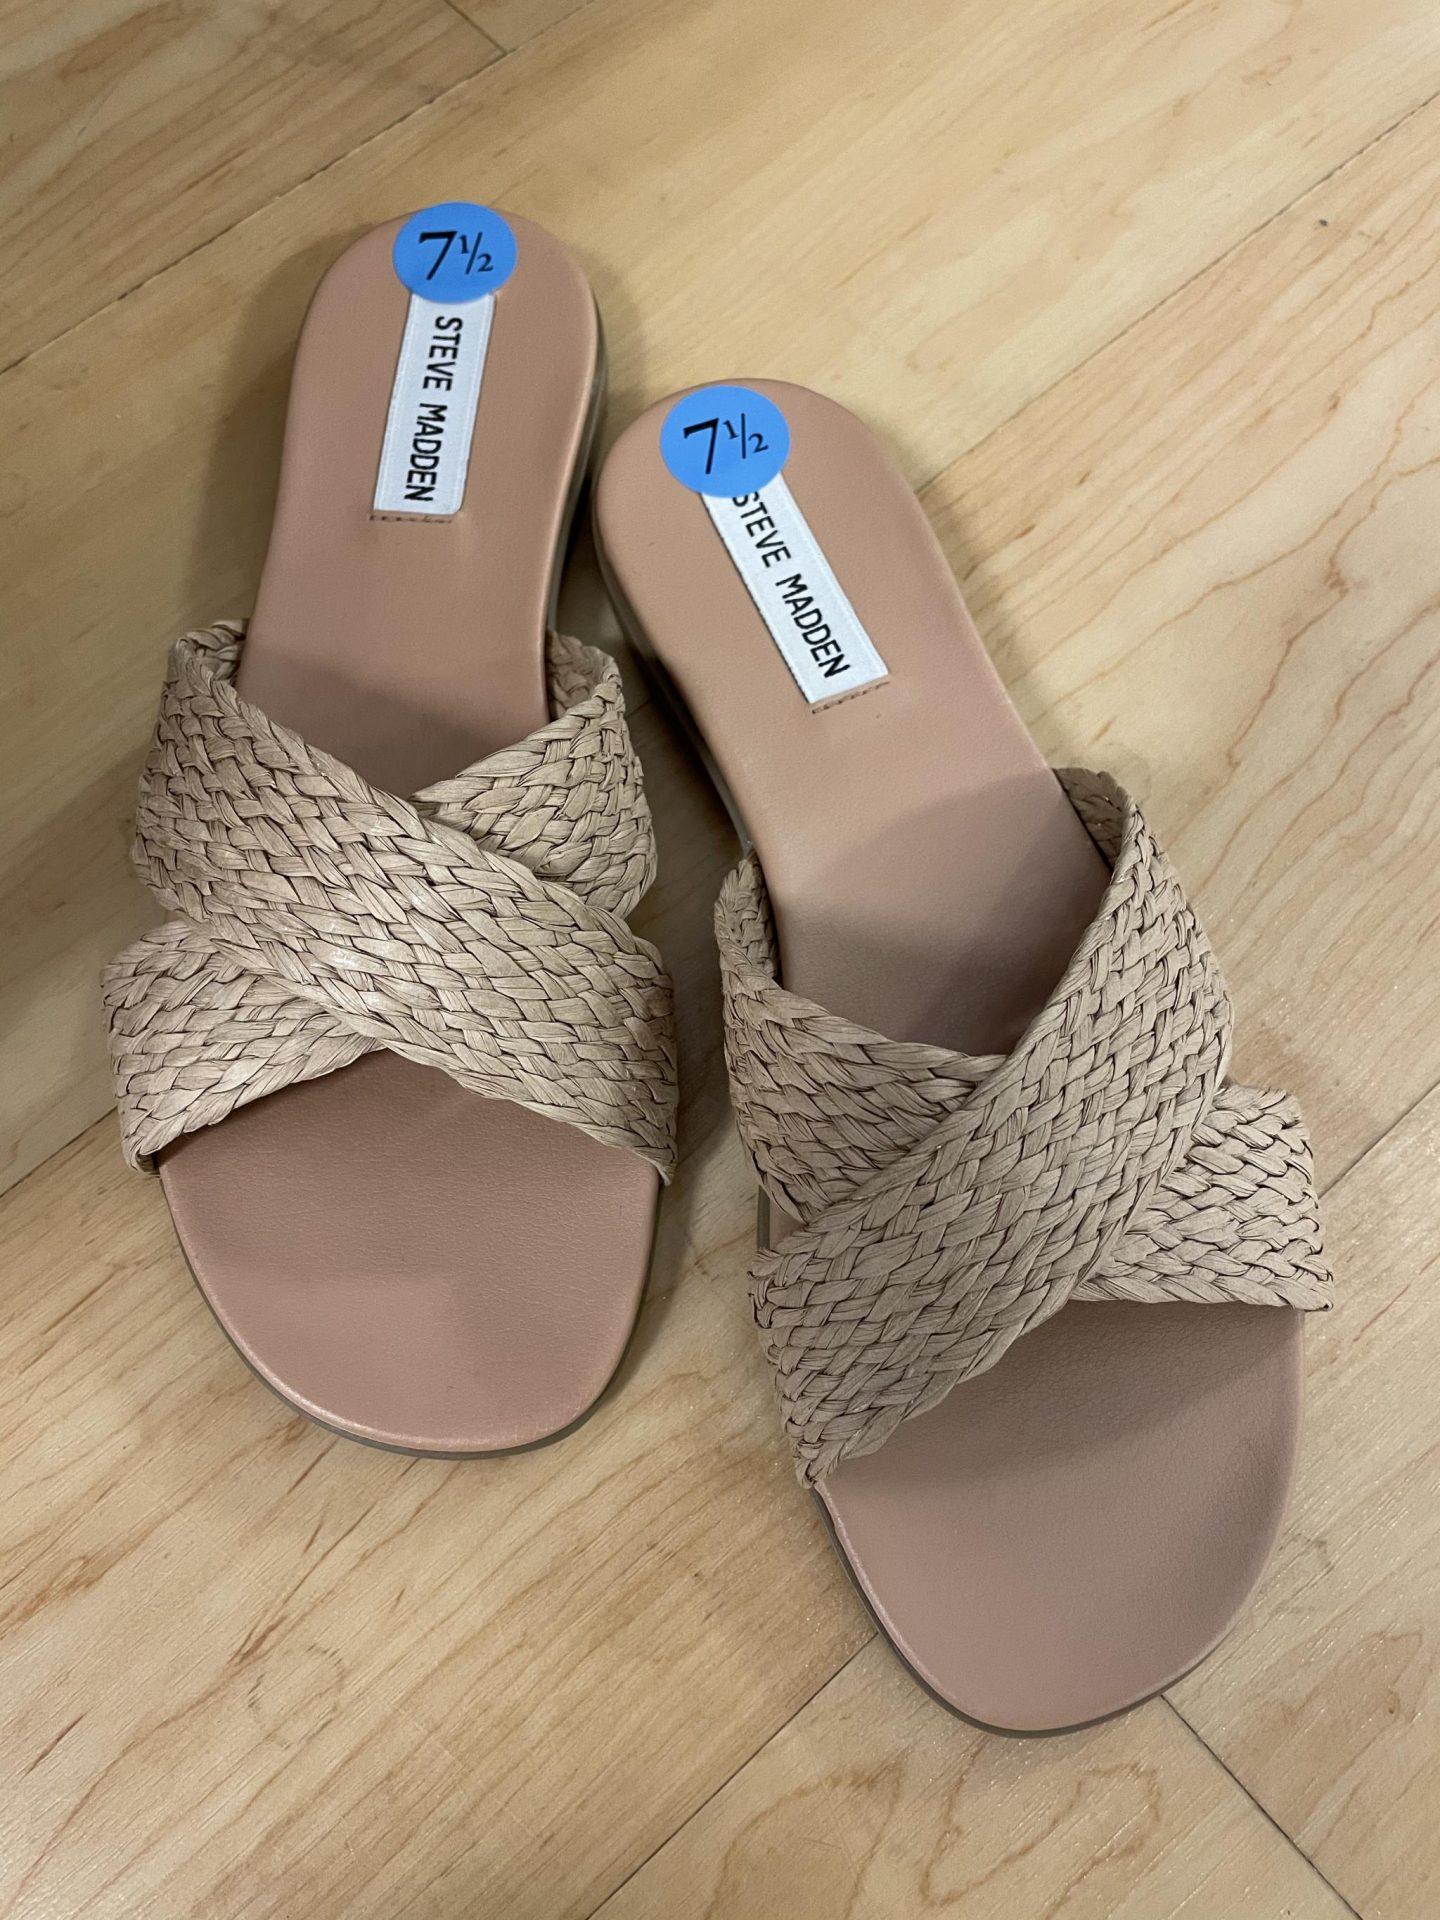 Steve Madden Vlaty Sandals in natural